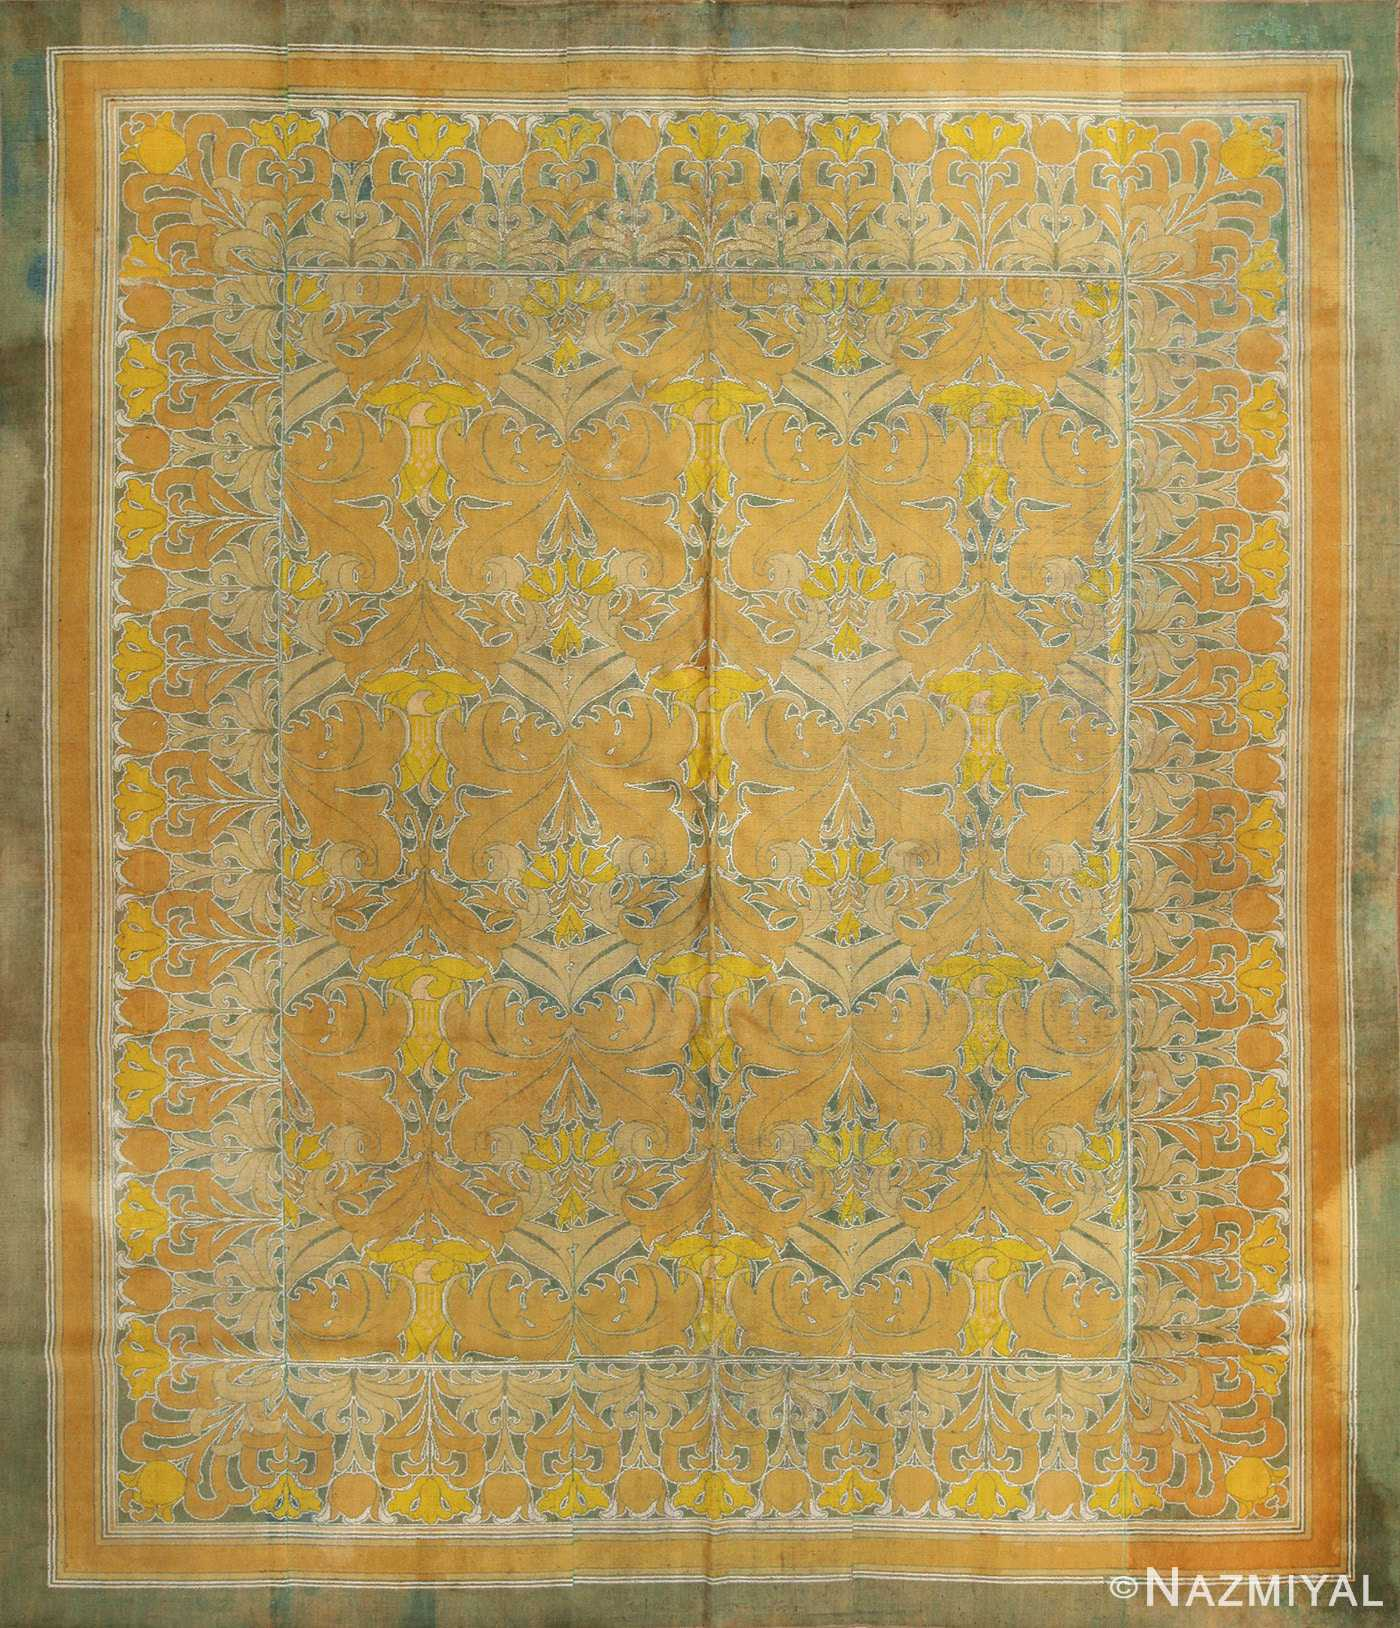 antique wilton english arts and crafts rug 2657 Nazmiyal